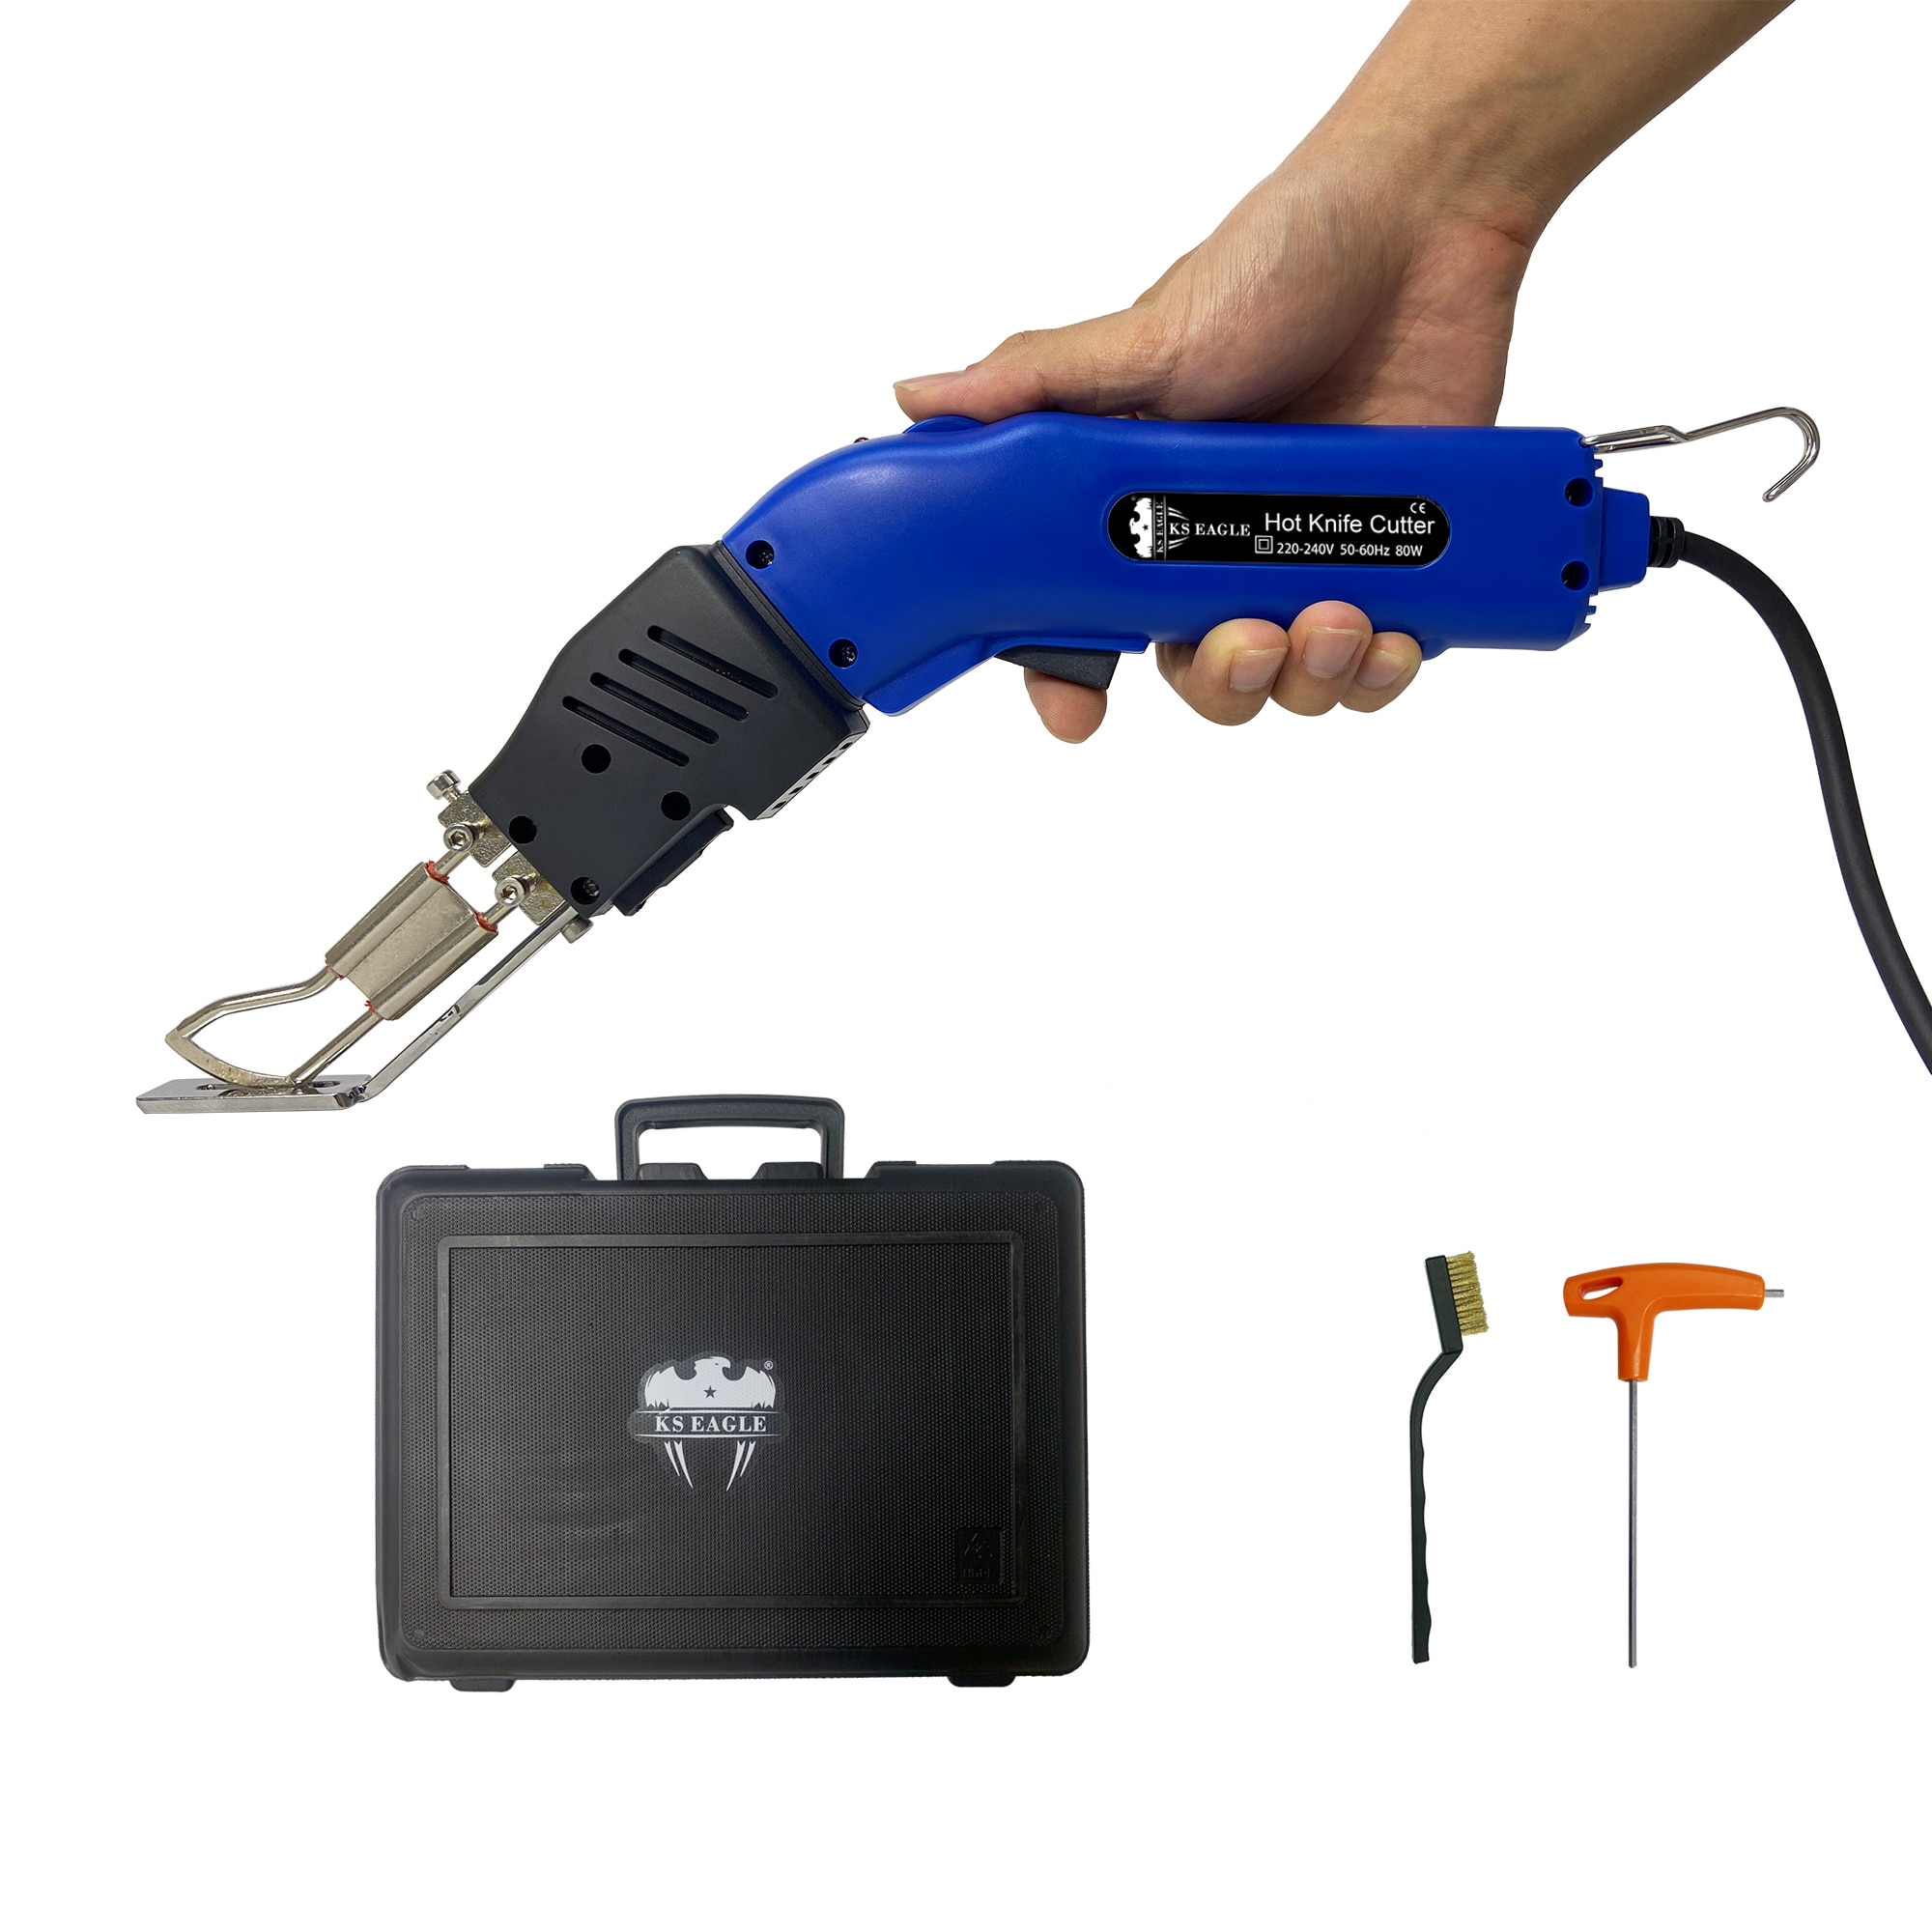 Нож для резки ткани KS EAGLE, электрический нож для резки ткани, нож R-типа для резки ткани